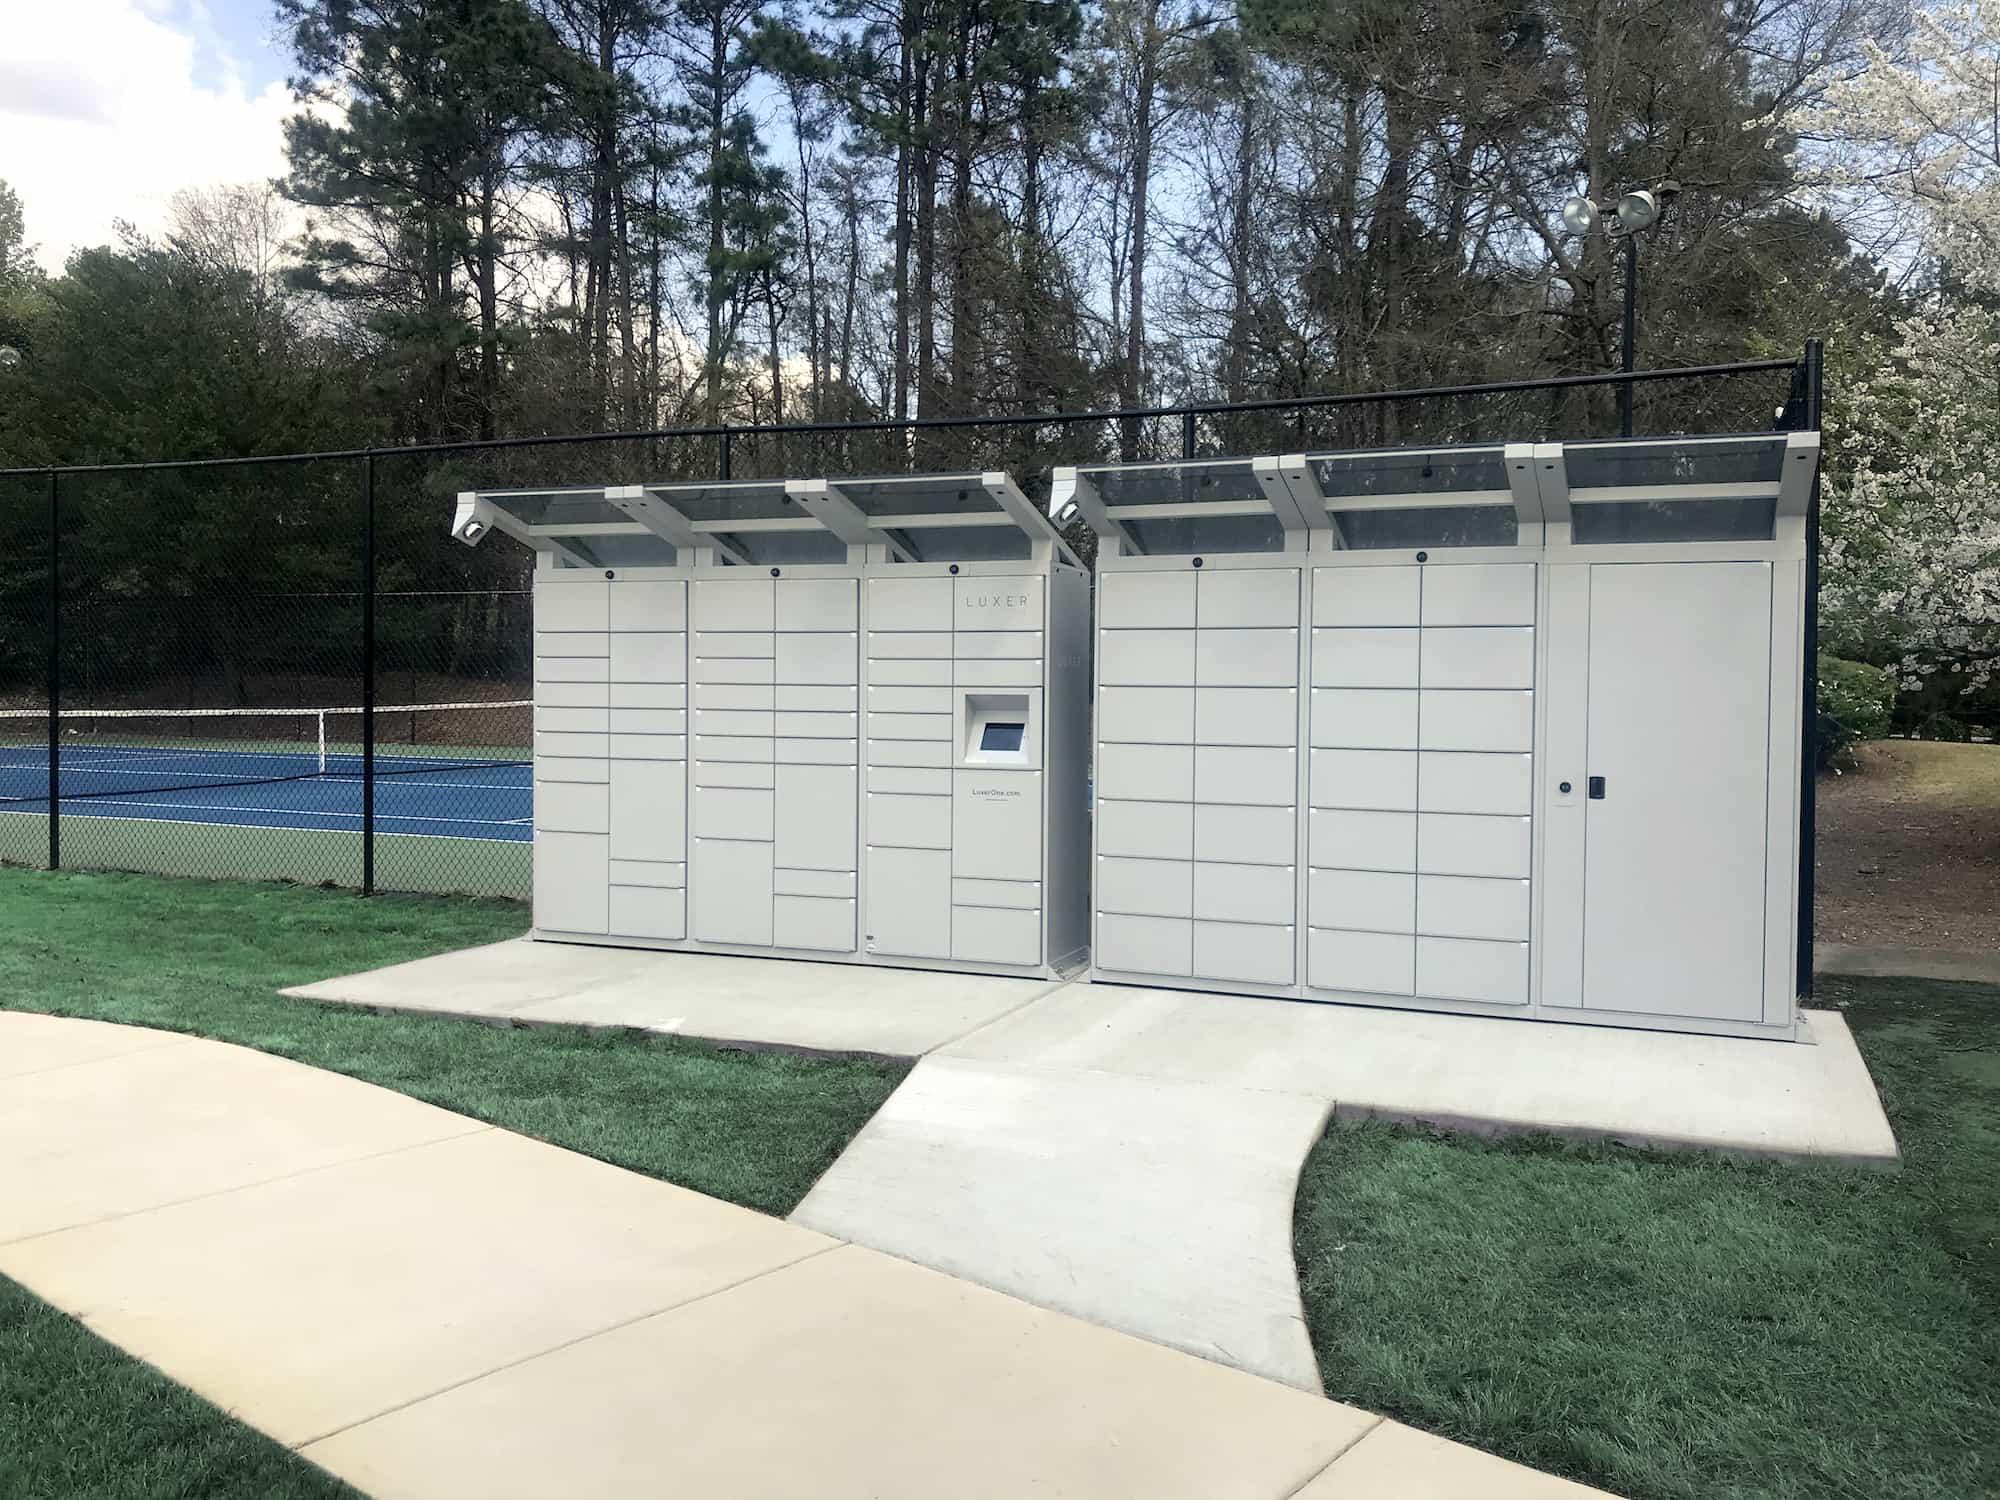 Outdoor Parcel Lockers - Westclub Park